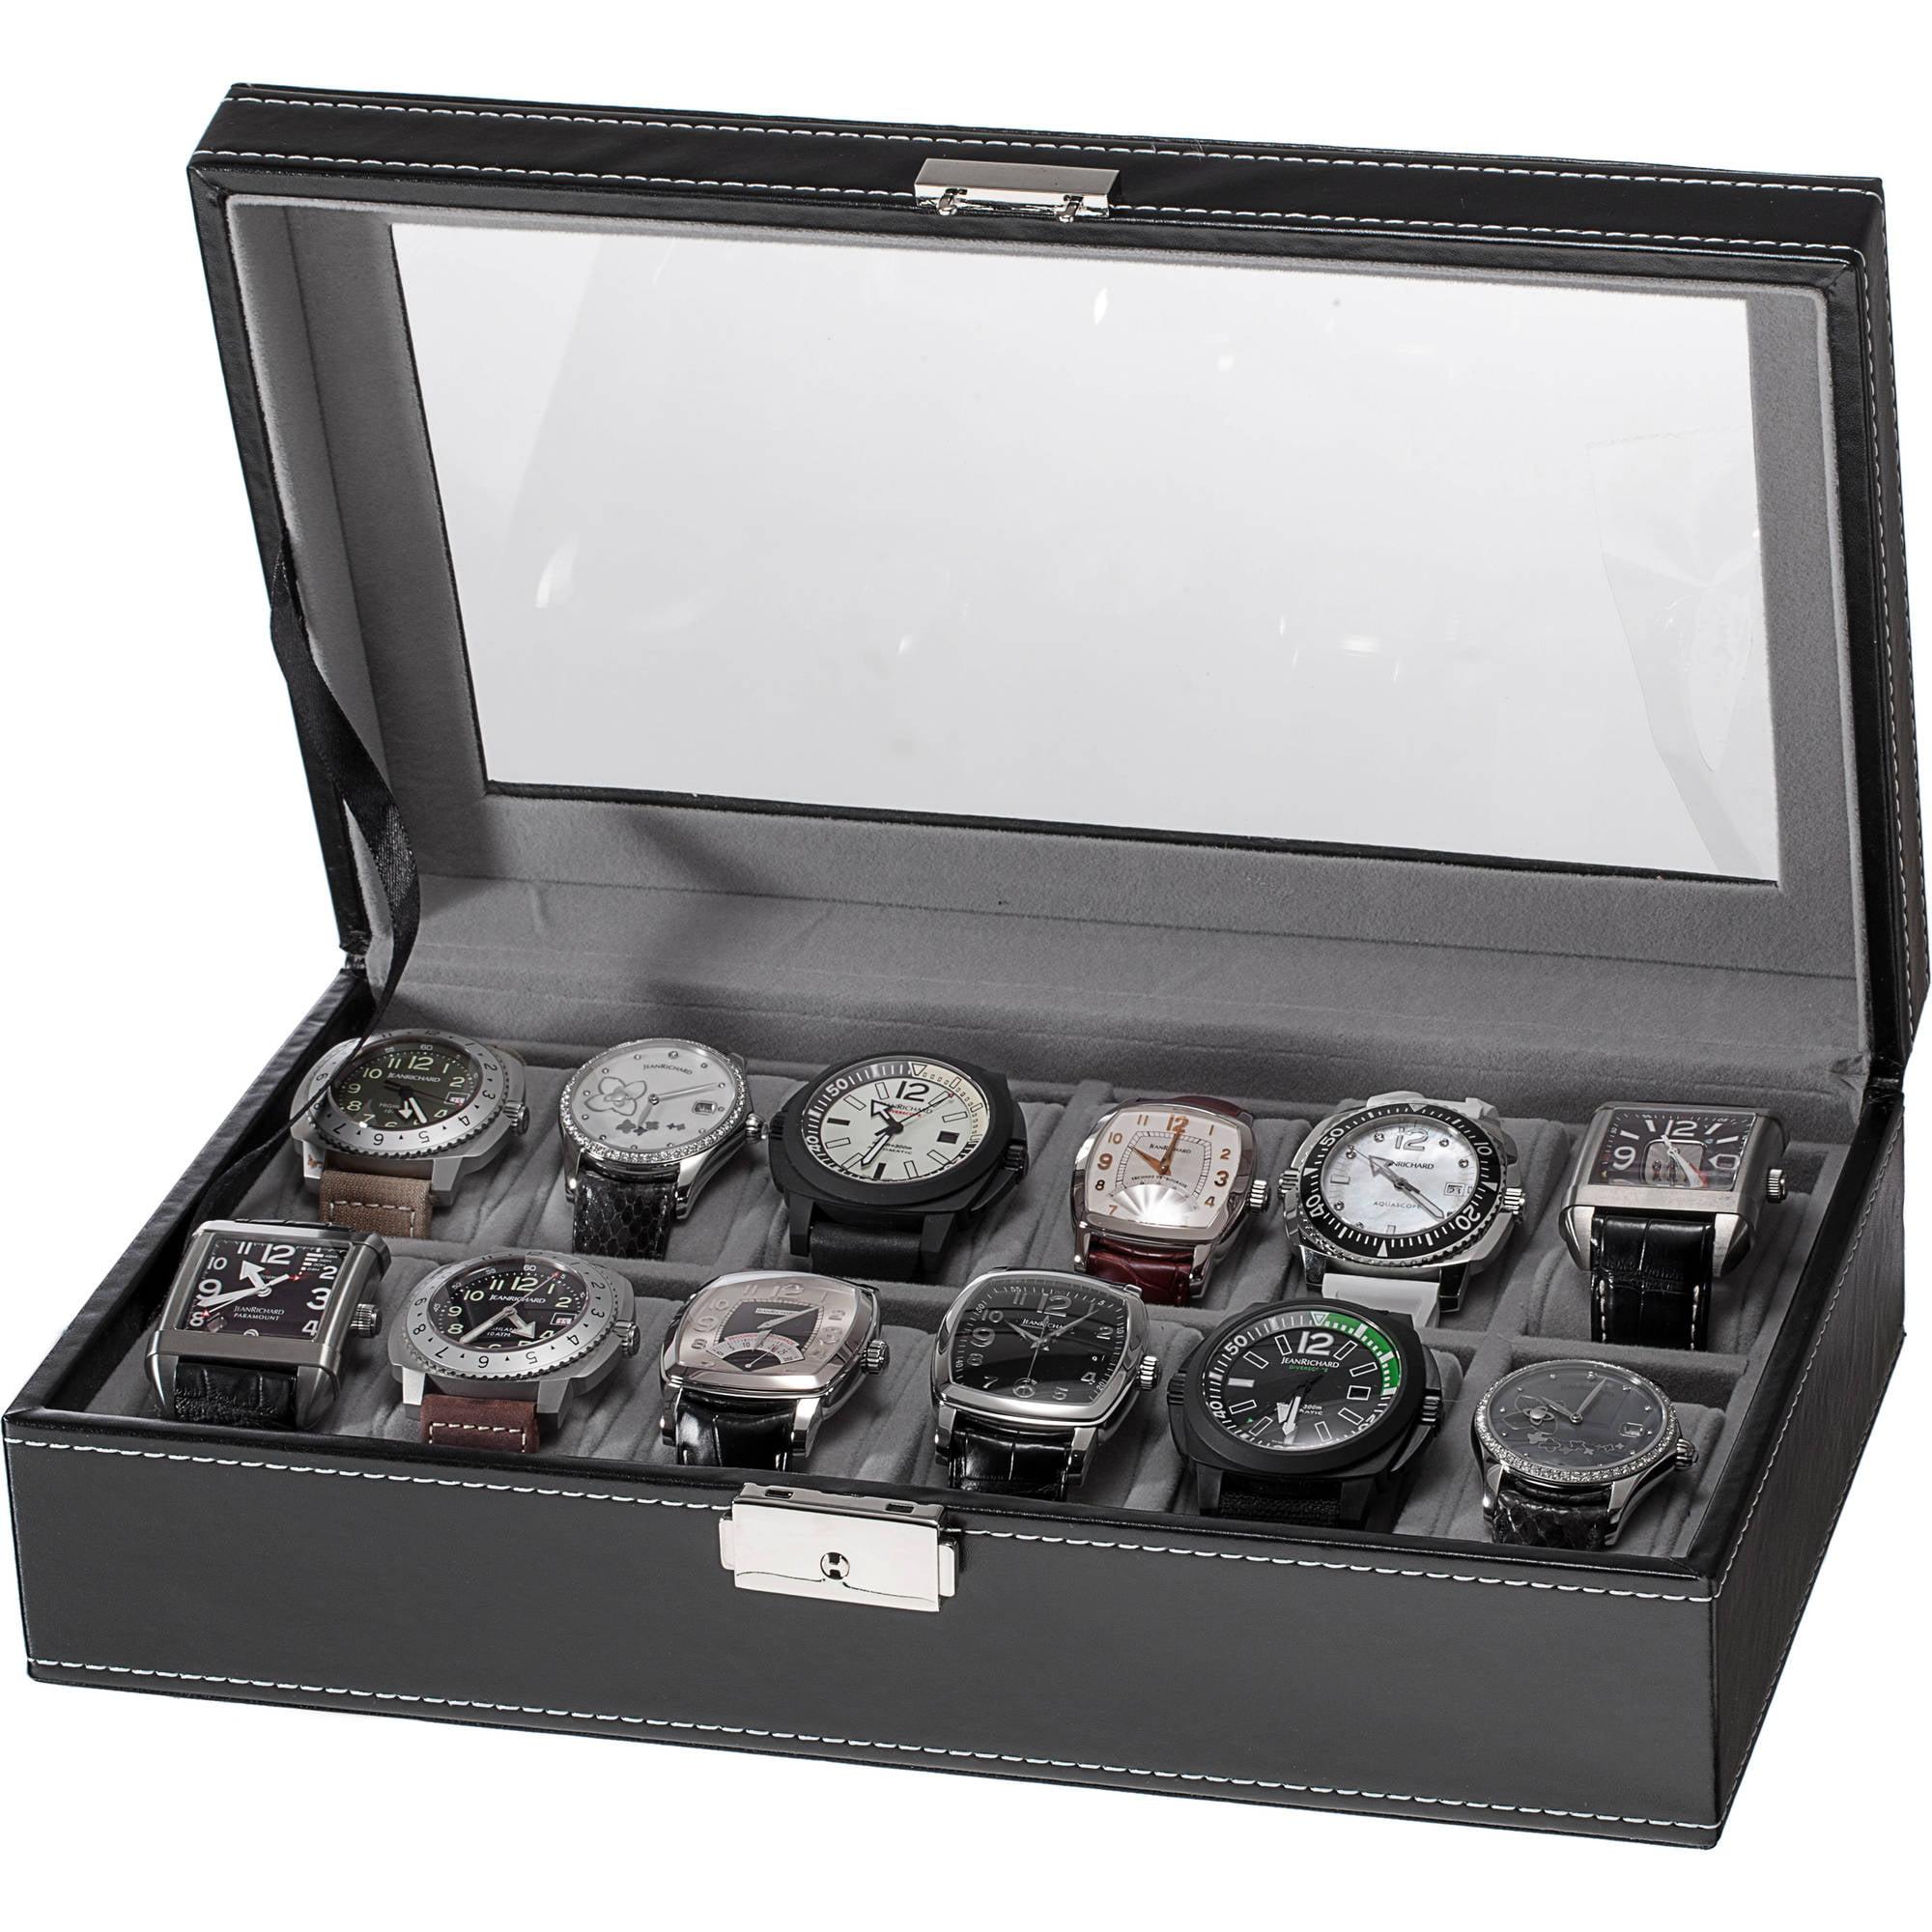 12-Slot Watch Box, Black